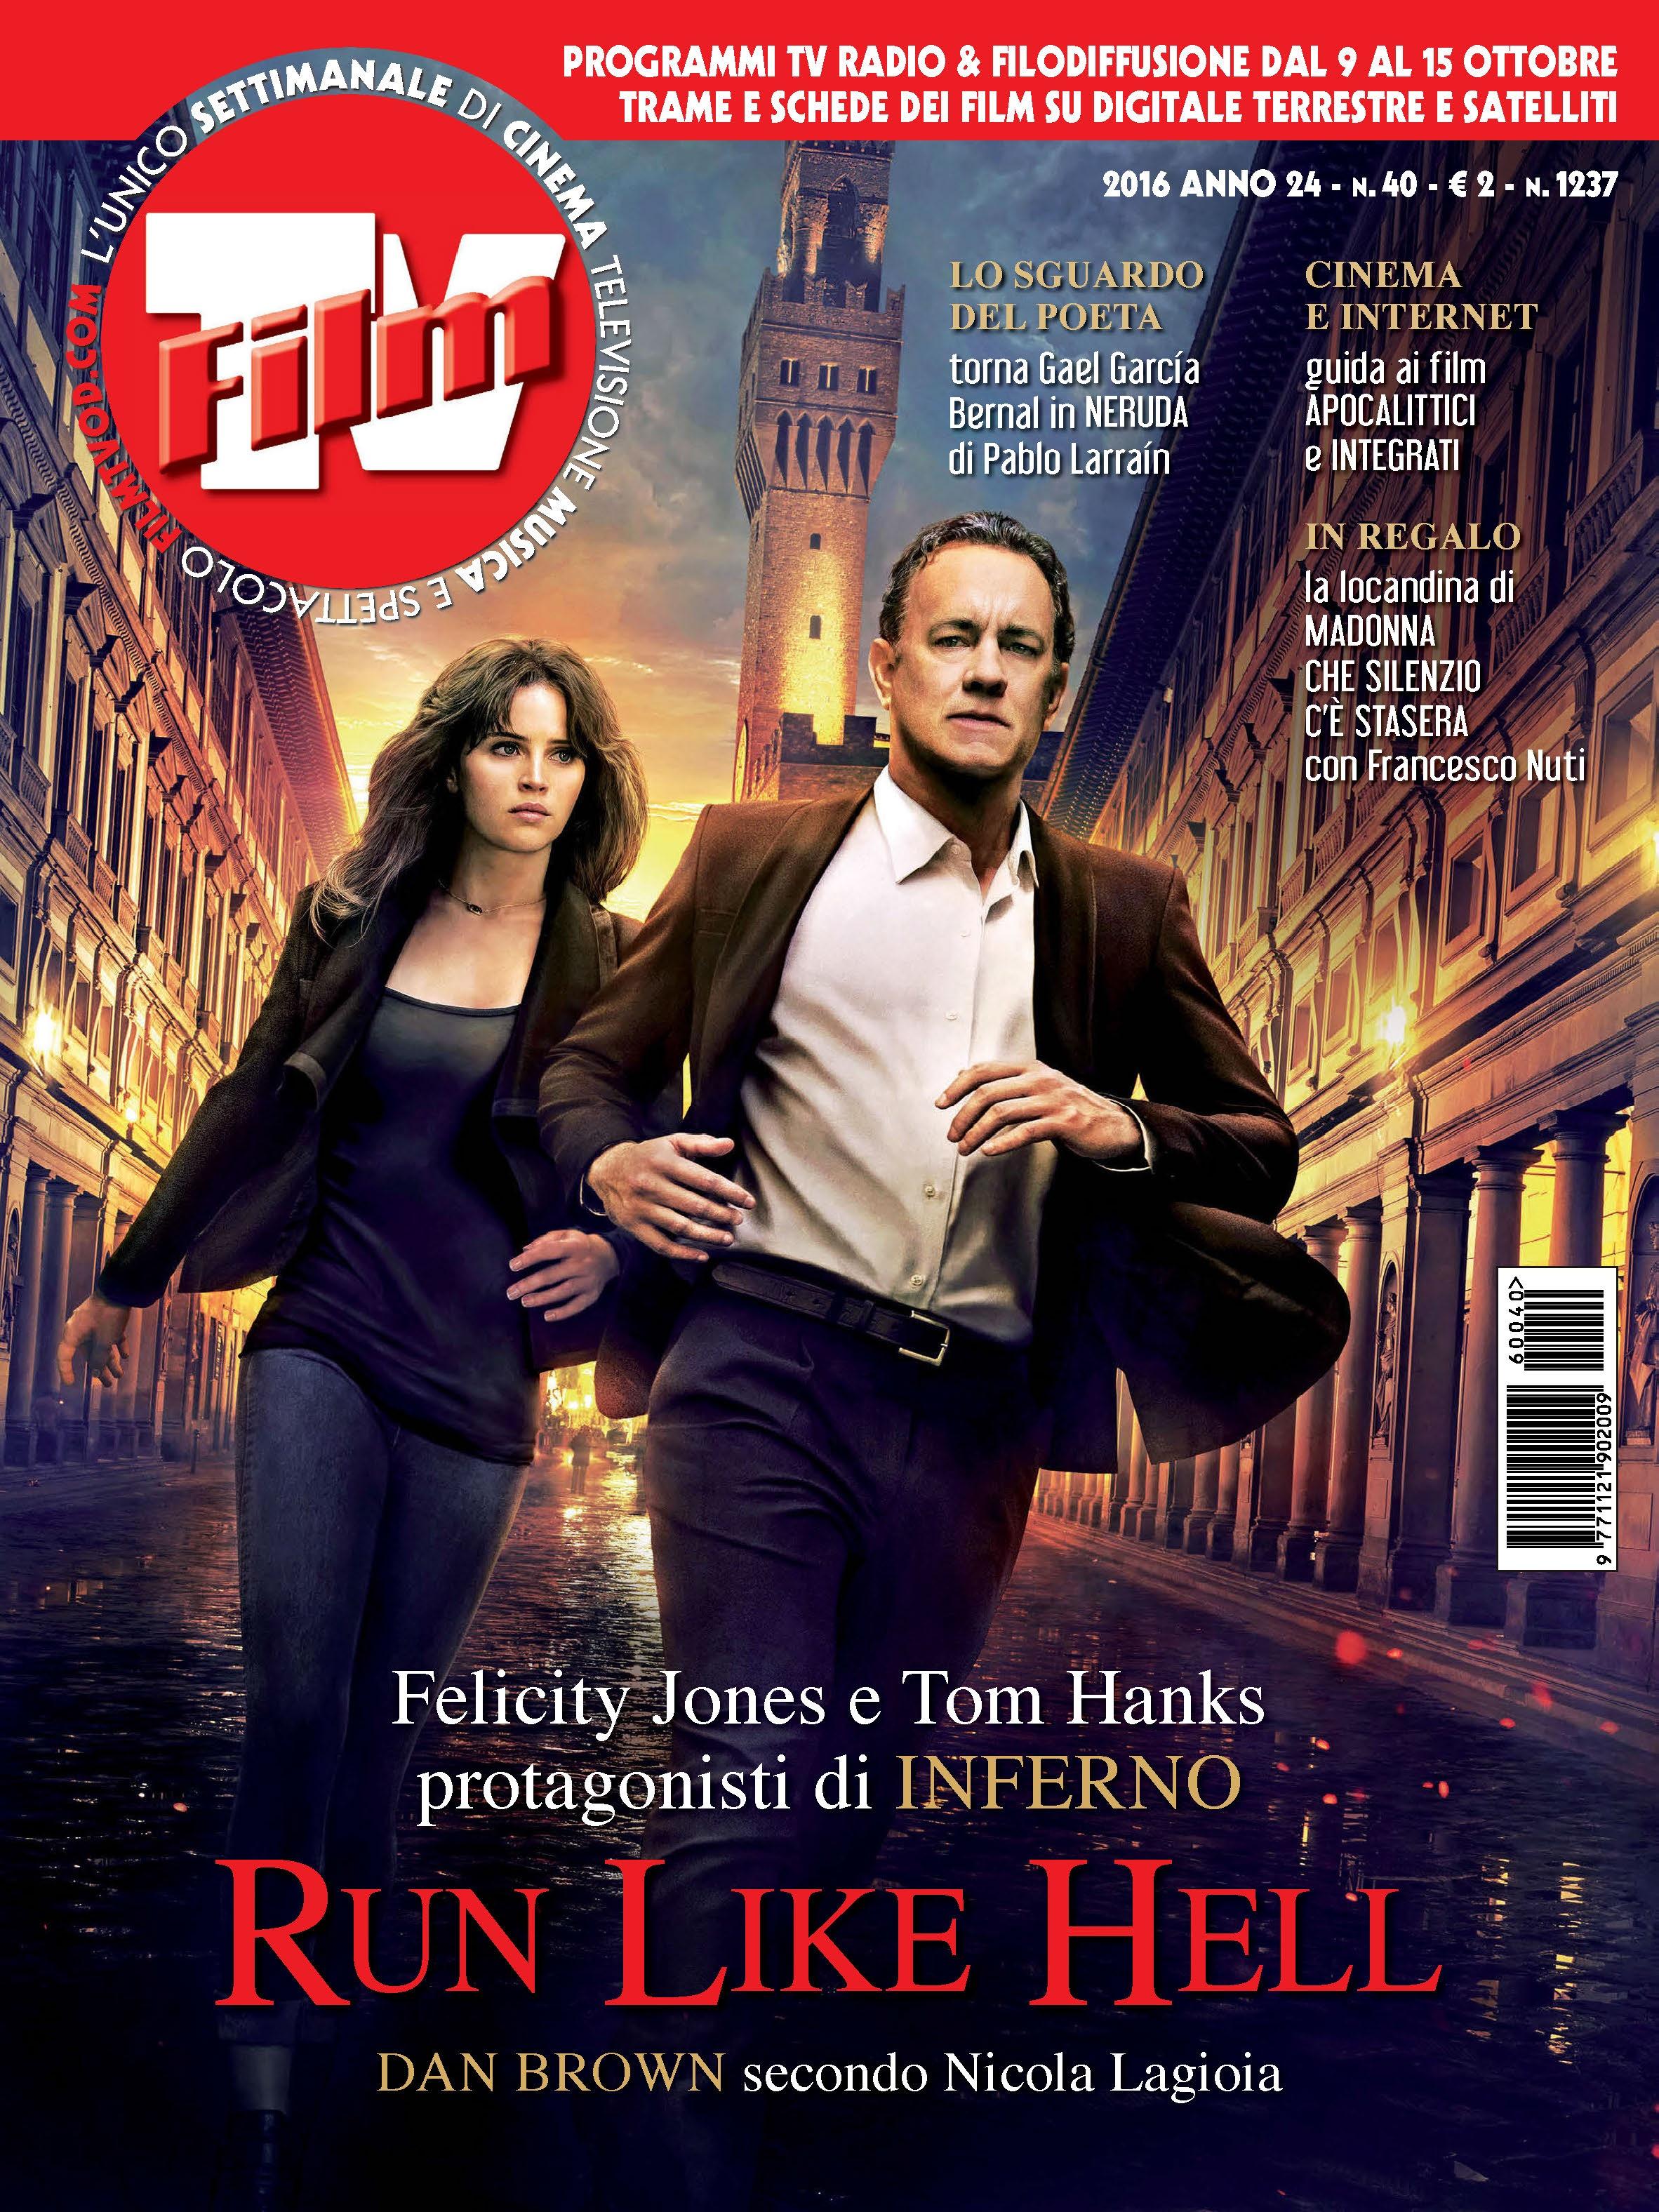 FilmTv n° 40 / 2016